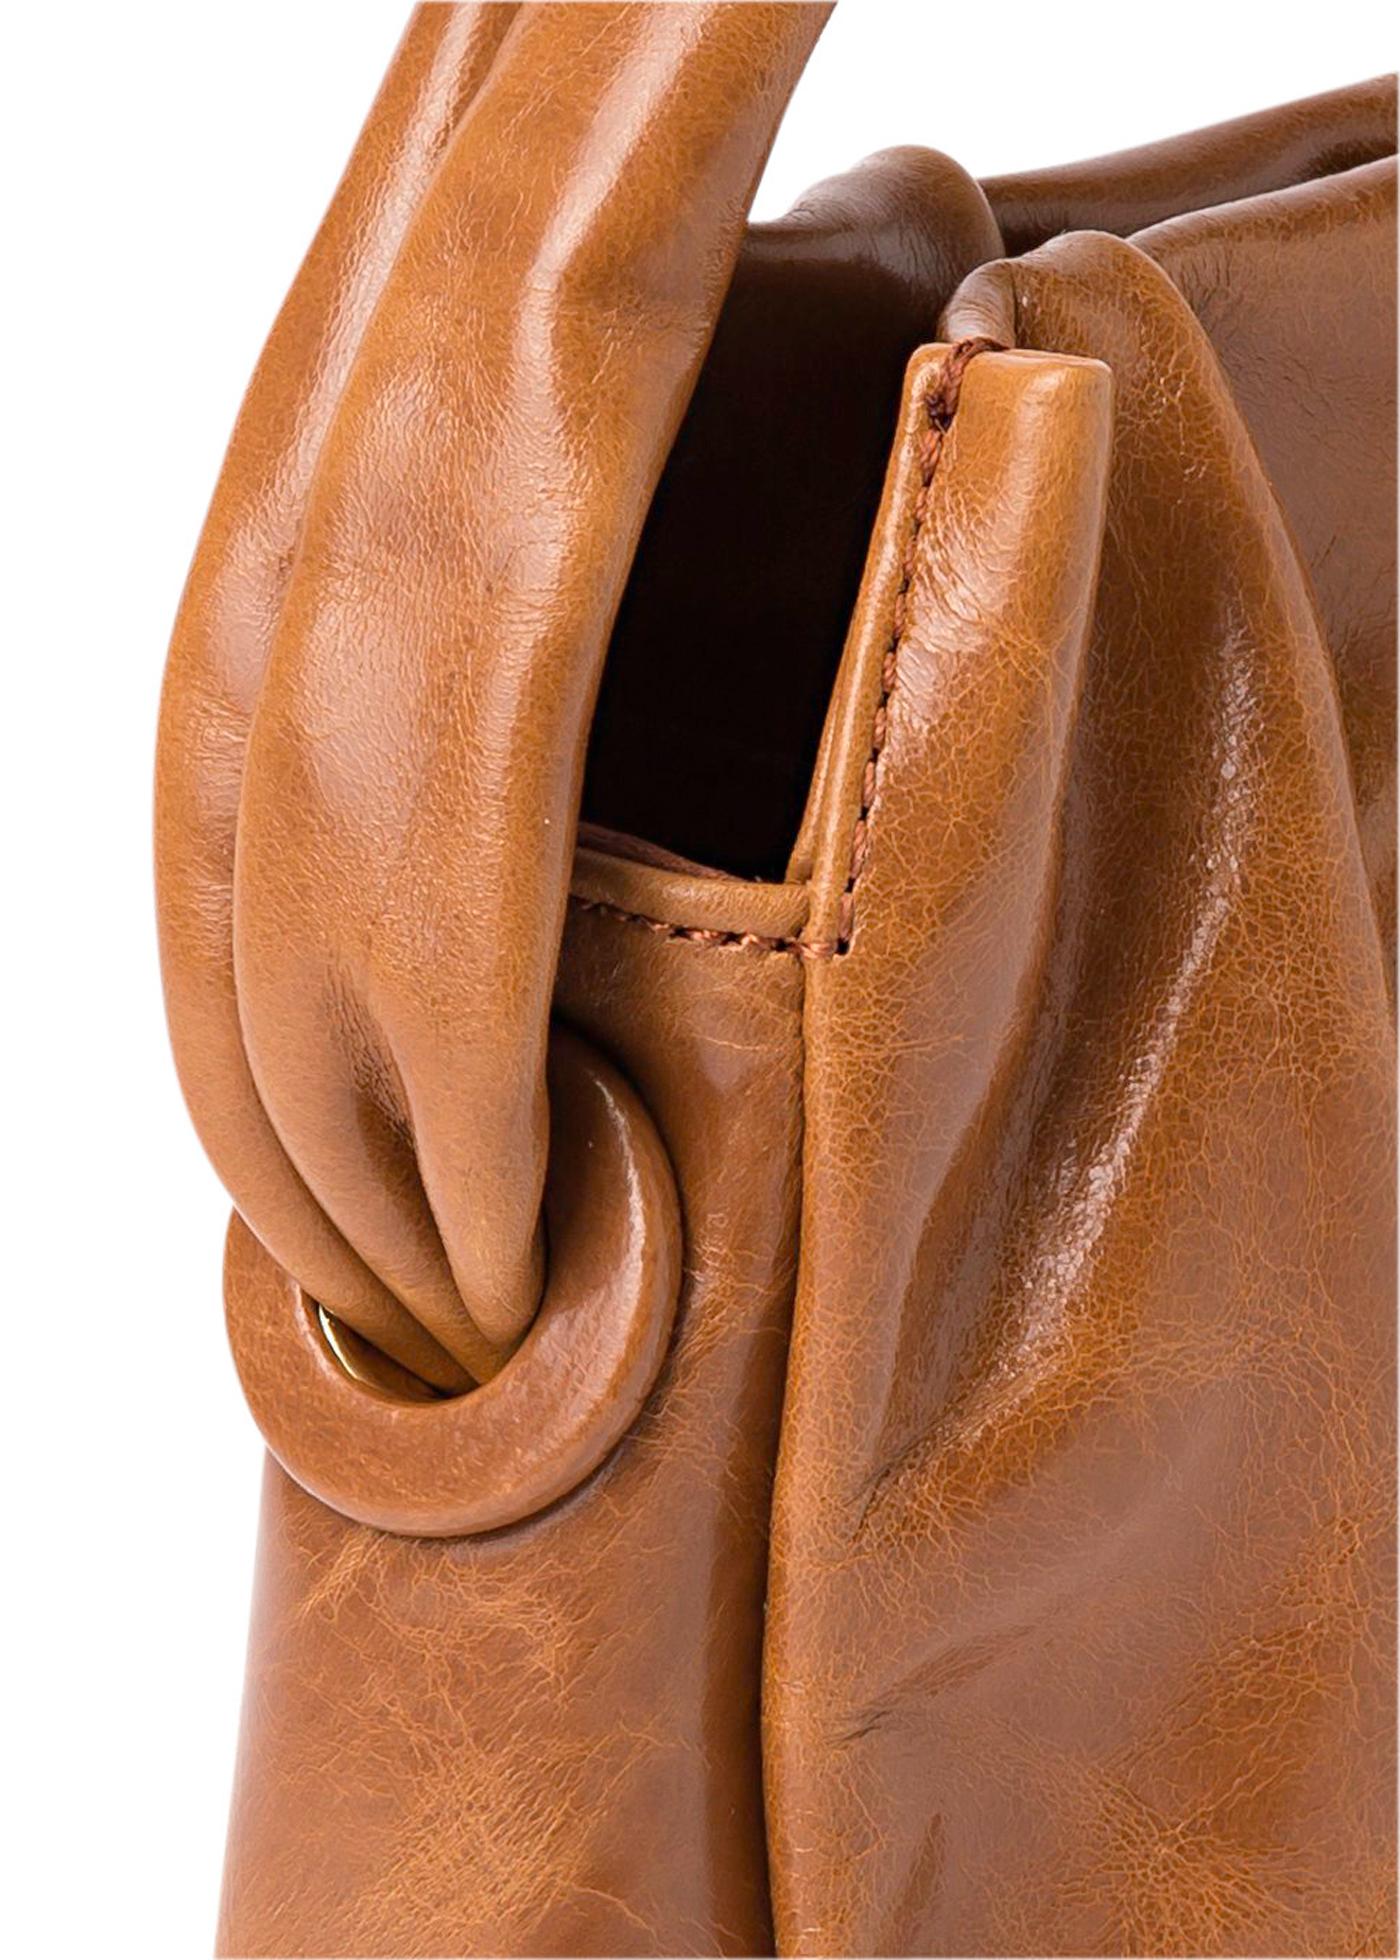 Long Vague Vintage Leather image number 2